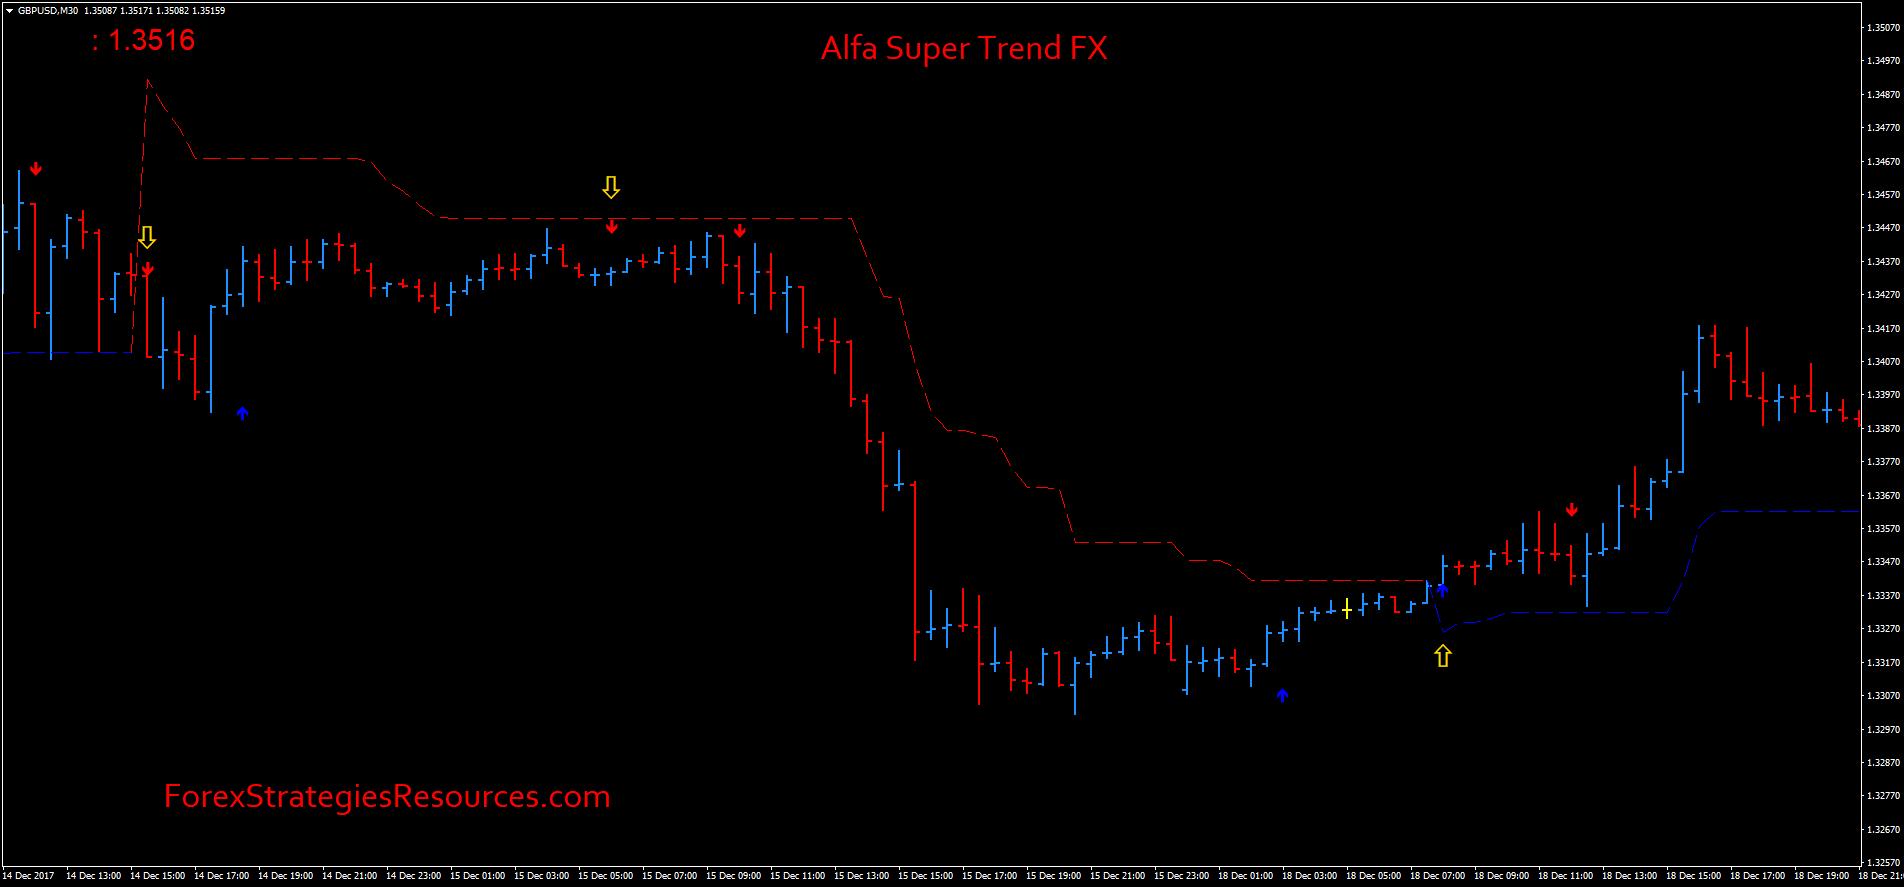 Free forex trading signals live bild 6